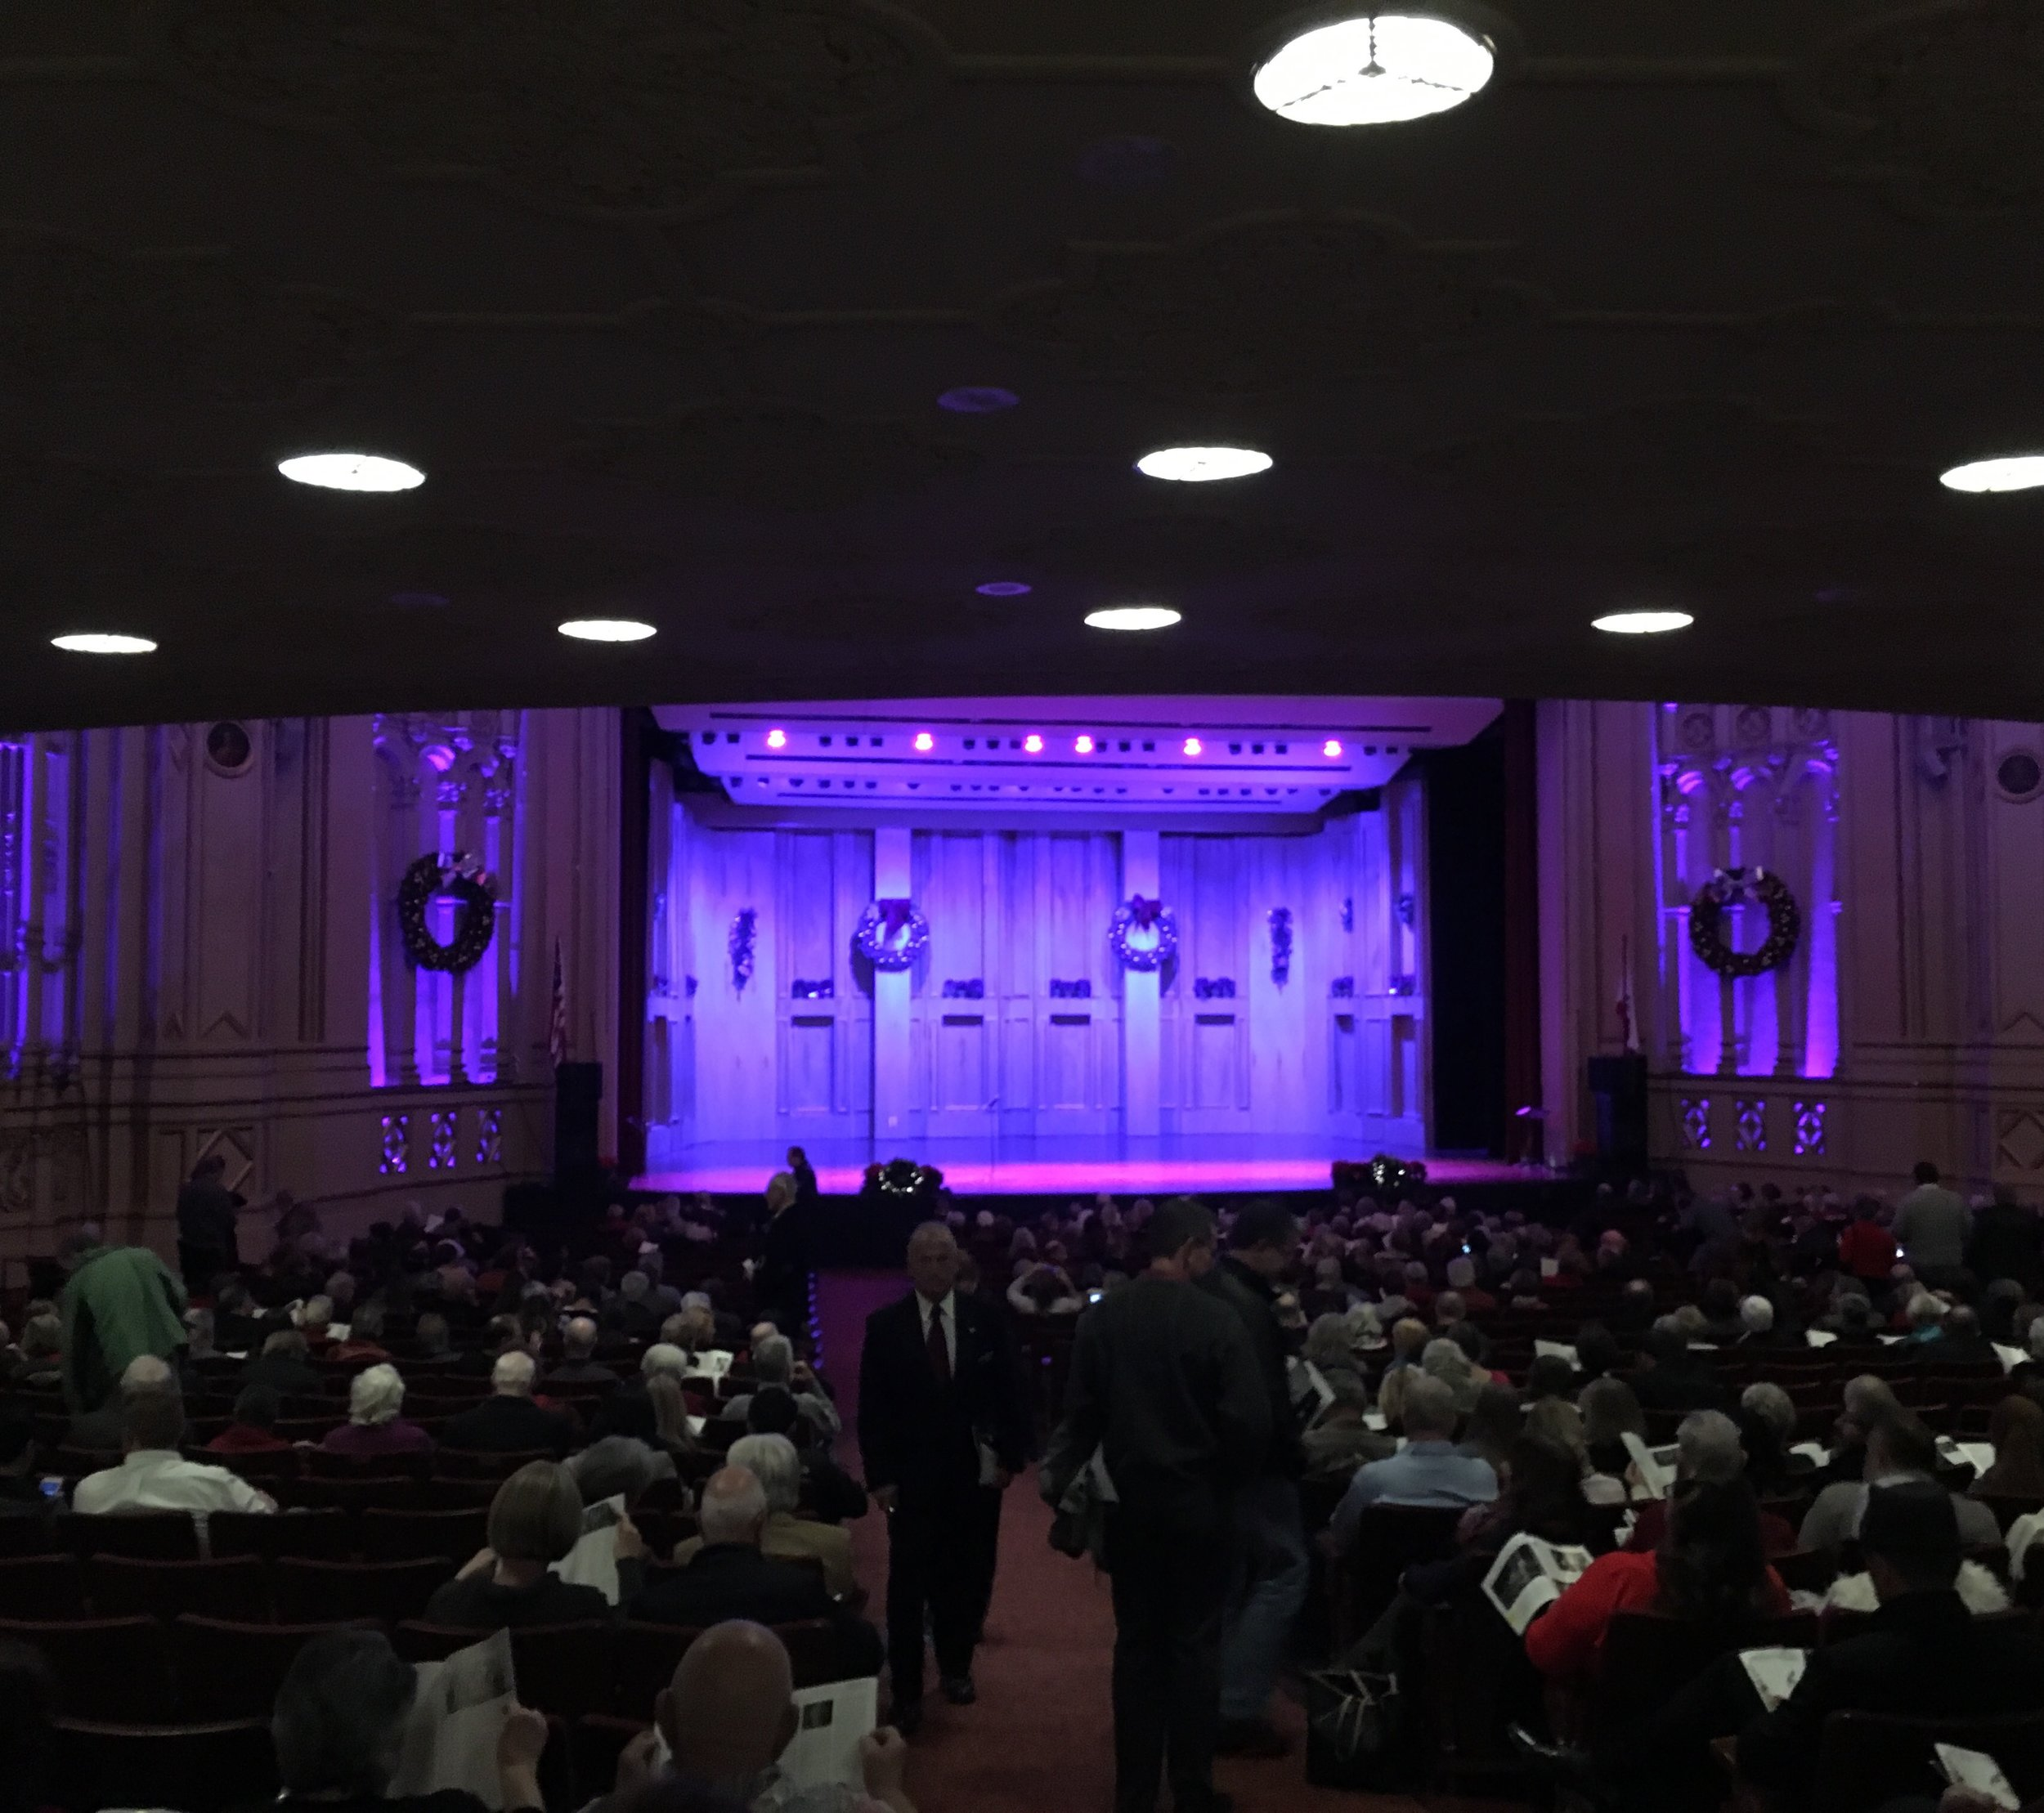 Copley Symphony Hall, San Diego